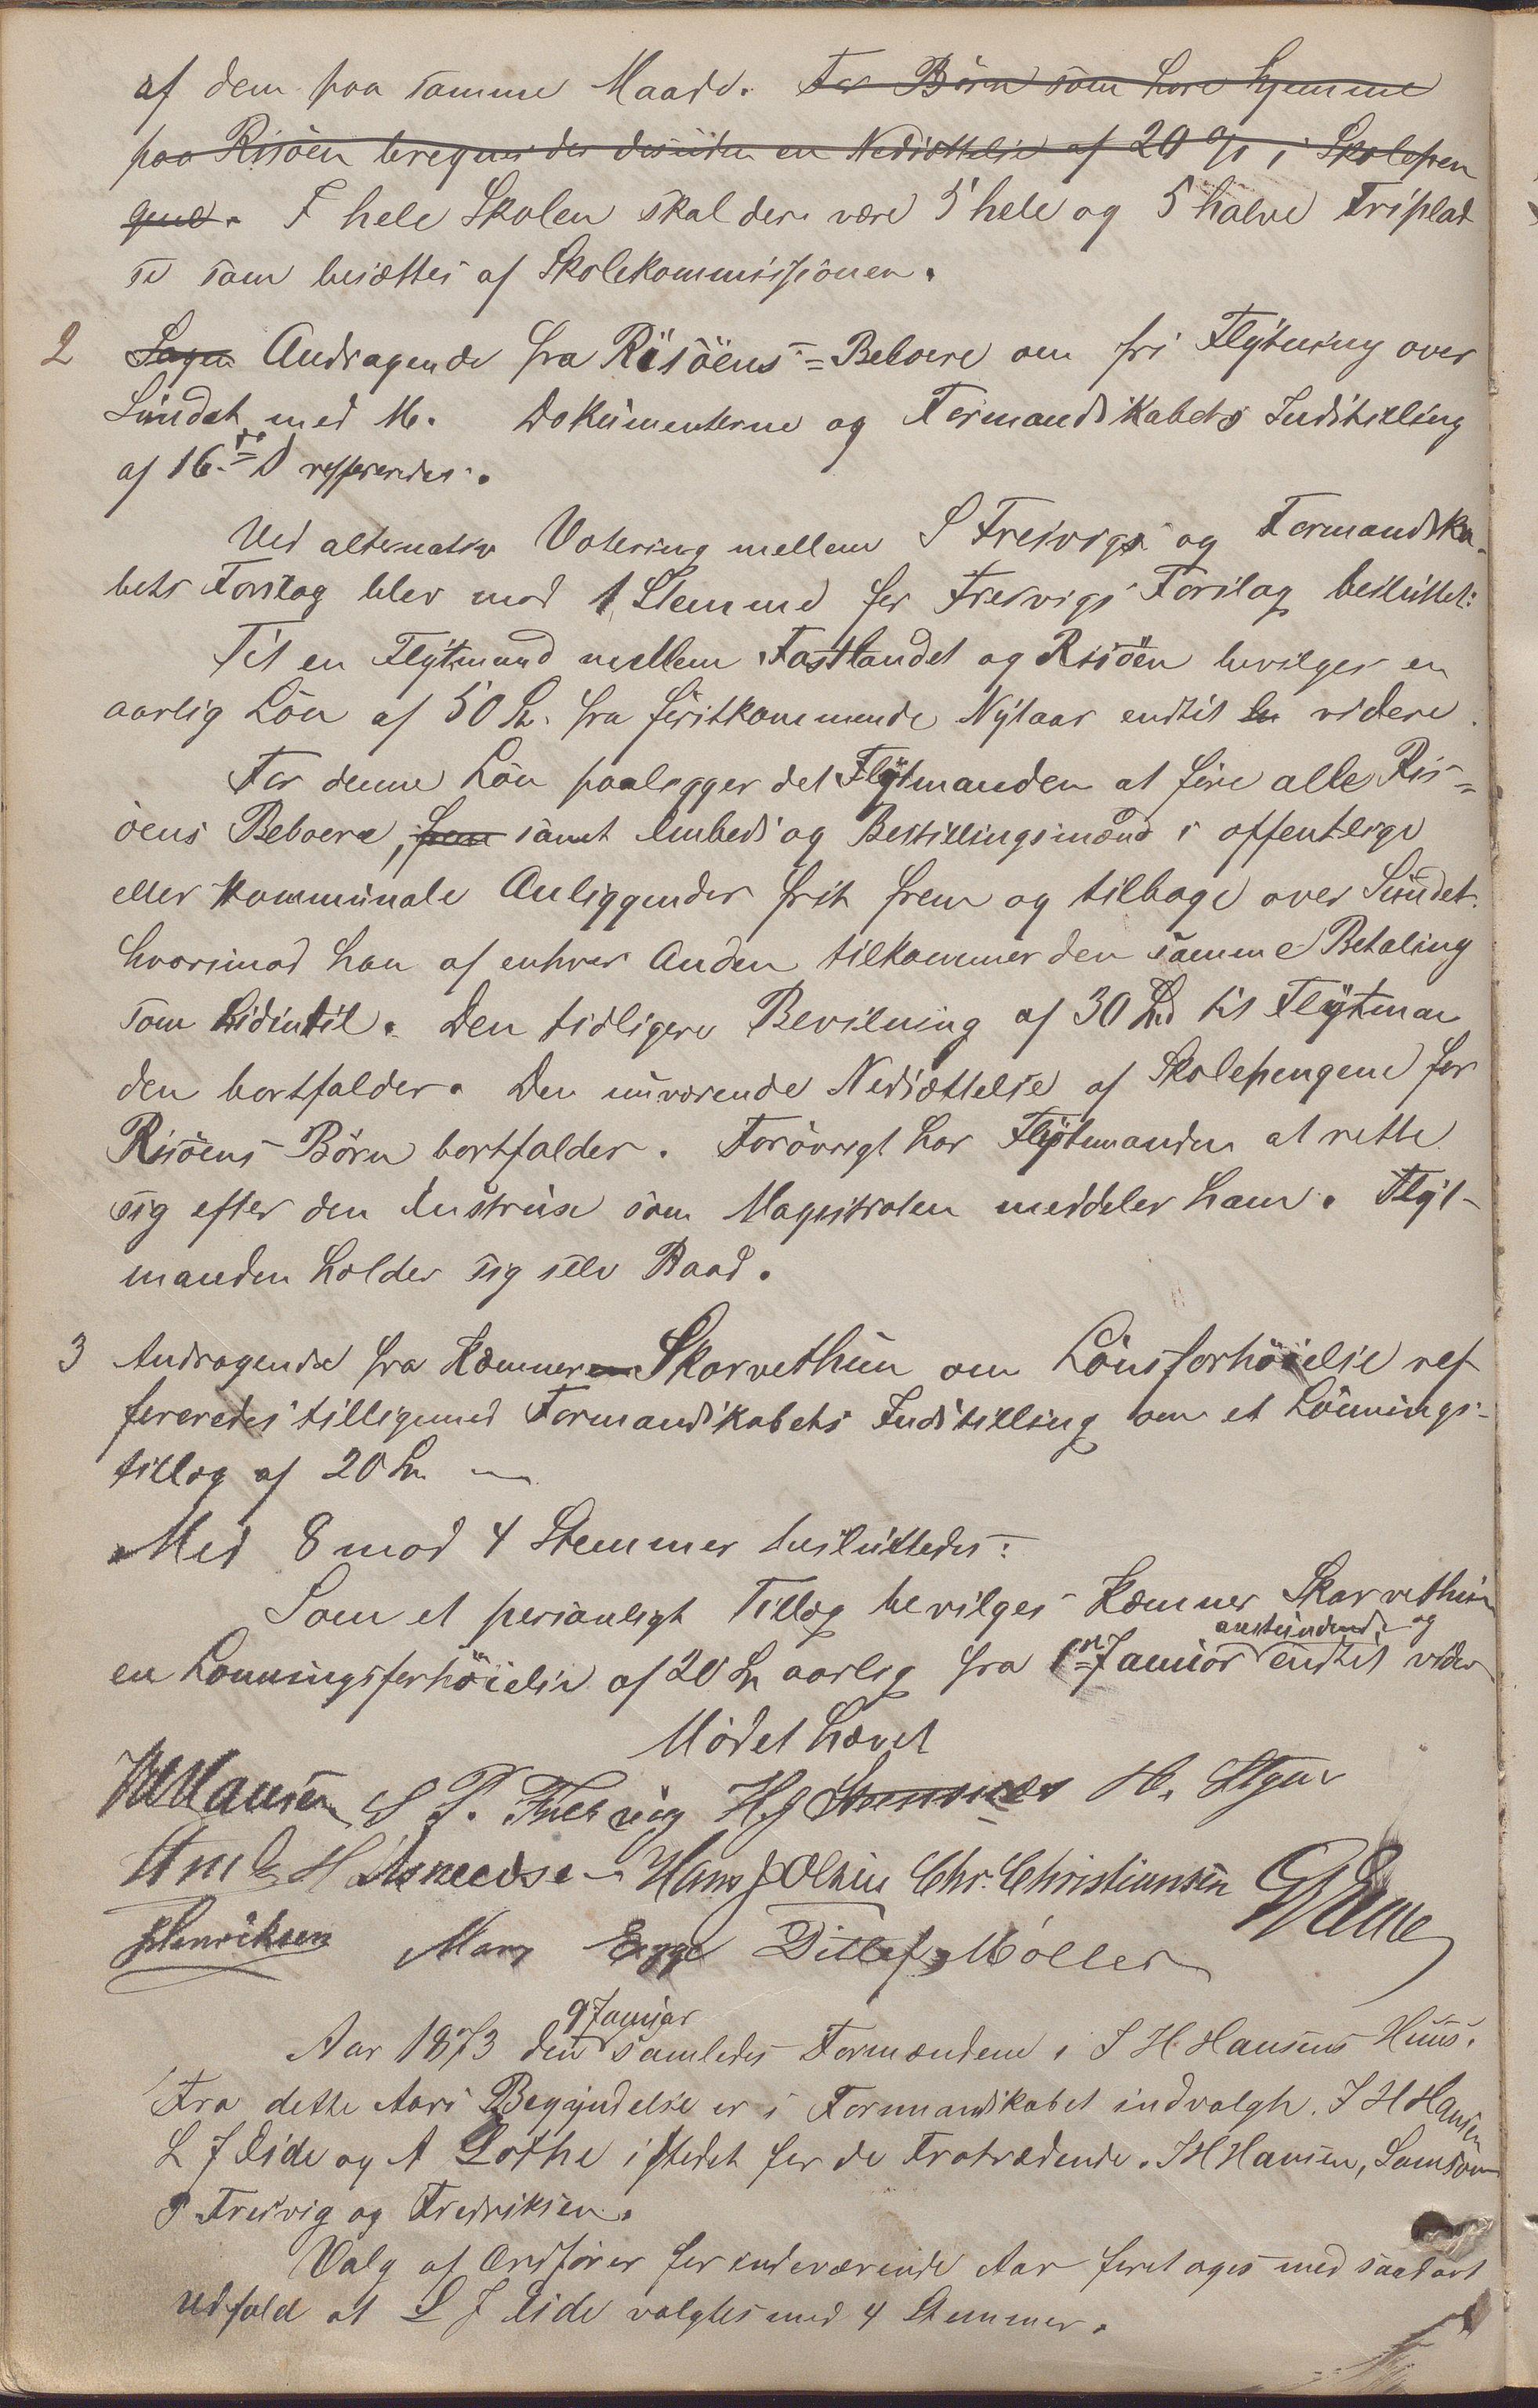 IKAR, Haugesund kommune - Formannskapet, 1866-1878, s. 88b